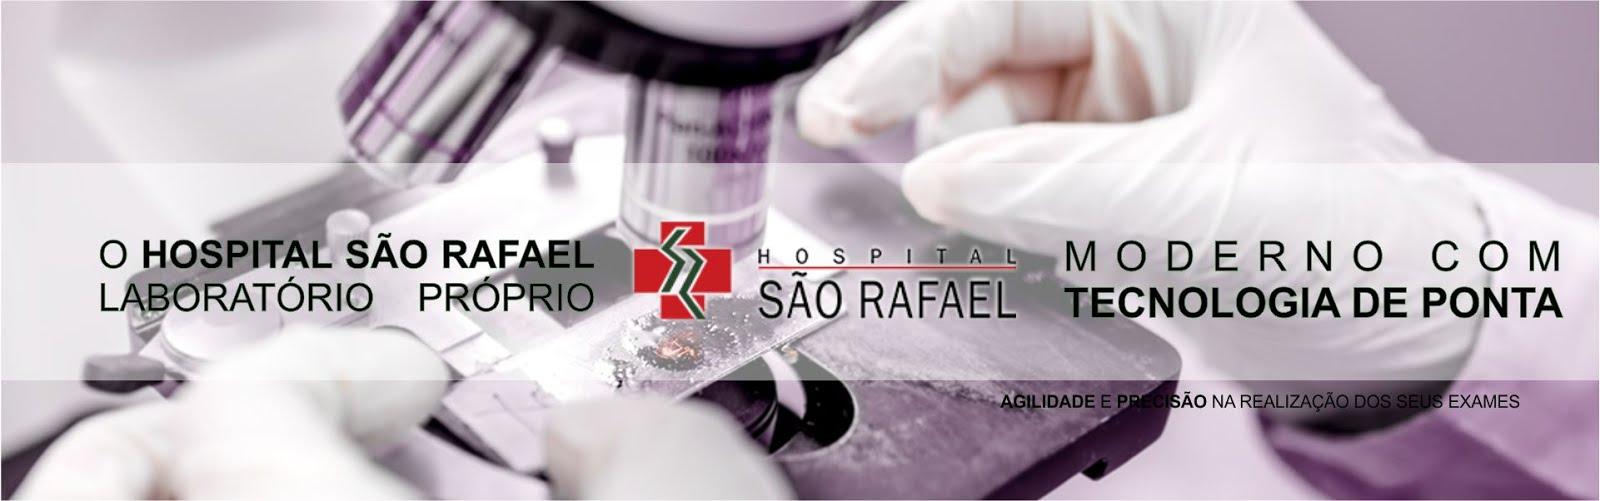 HOSPITAL SÃO RAFAEL (99) 2101-3900